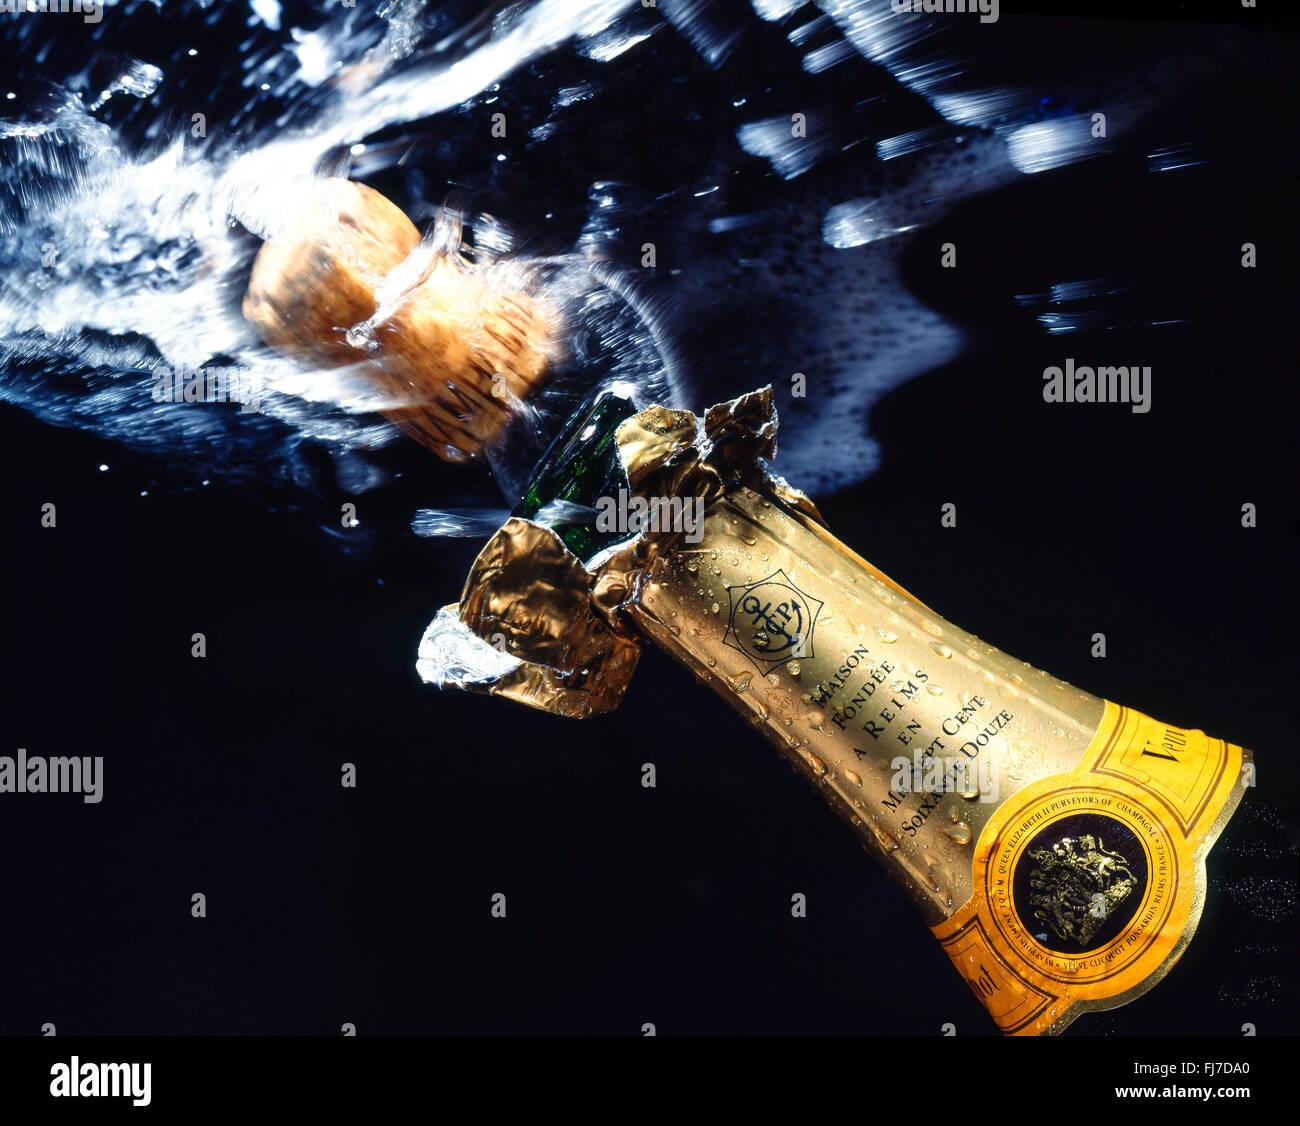 Veuve Clicquot champagne cork popping, Londres, Angleterre, Royaume-Uni Photo Stock